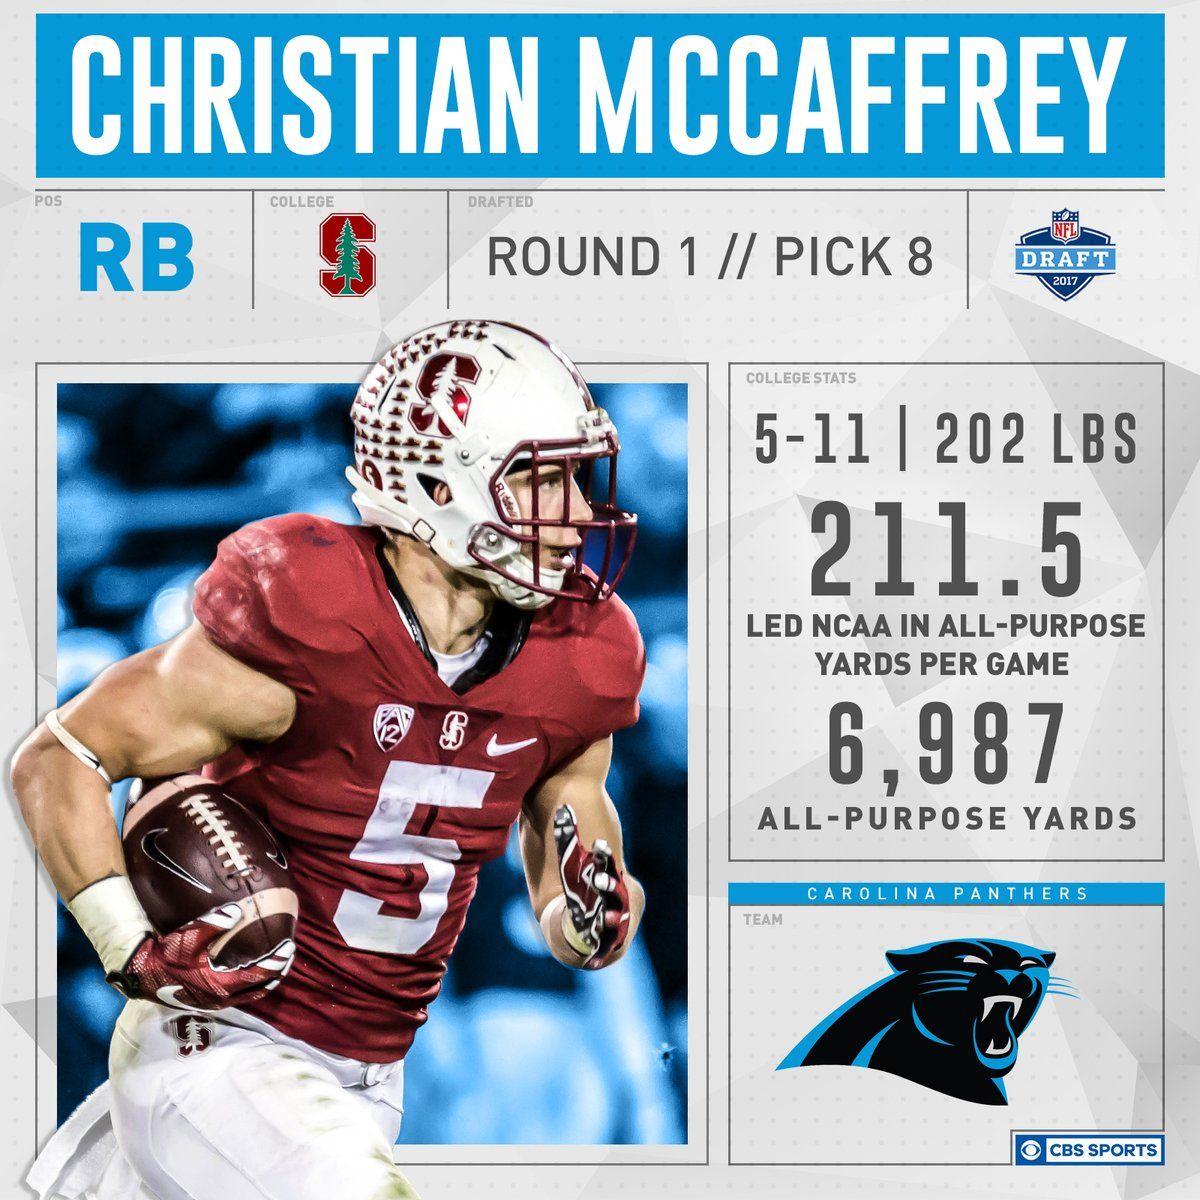 (5) Twitter Christian mccaffrey, Cbs sports, Nfc south